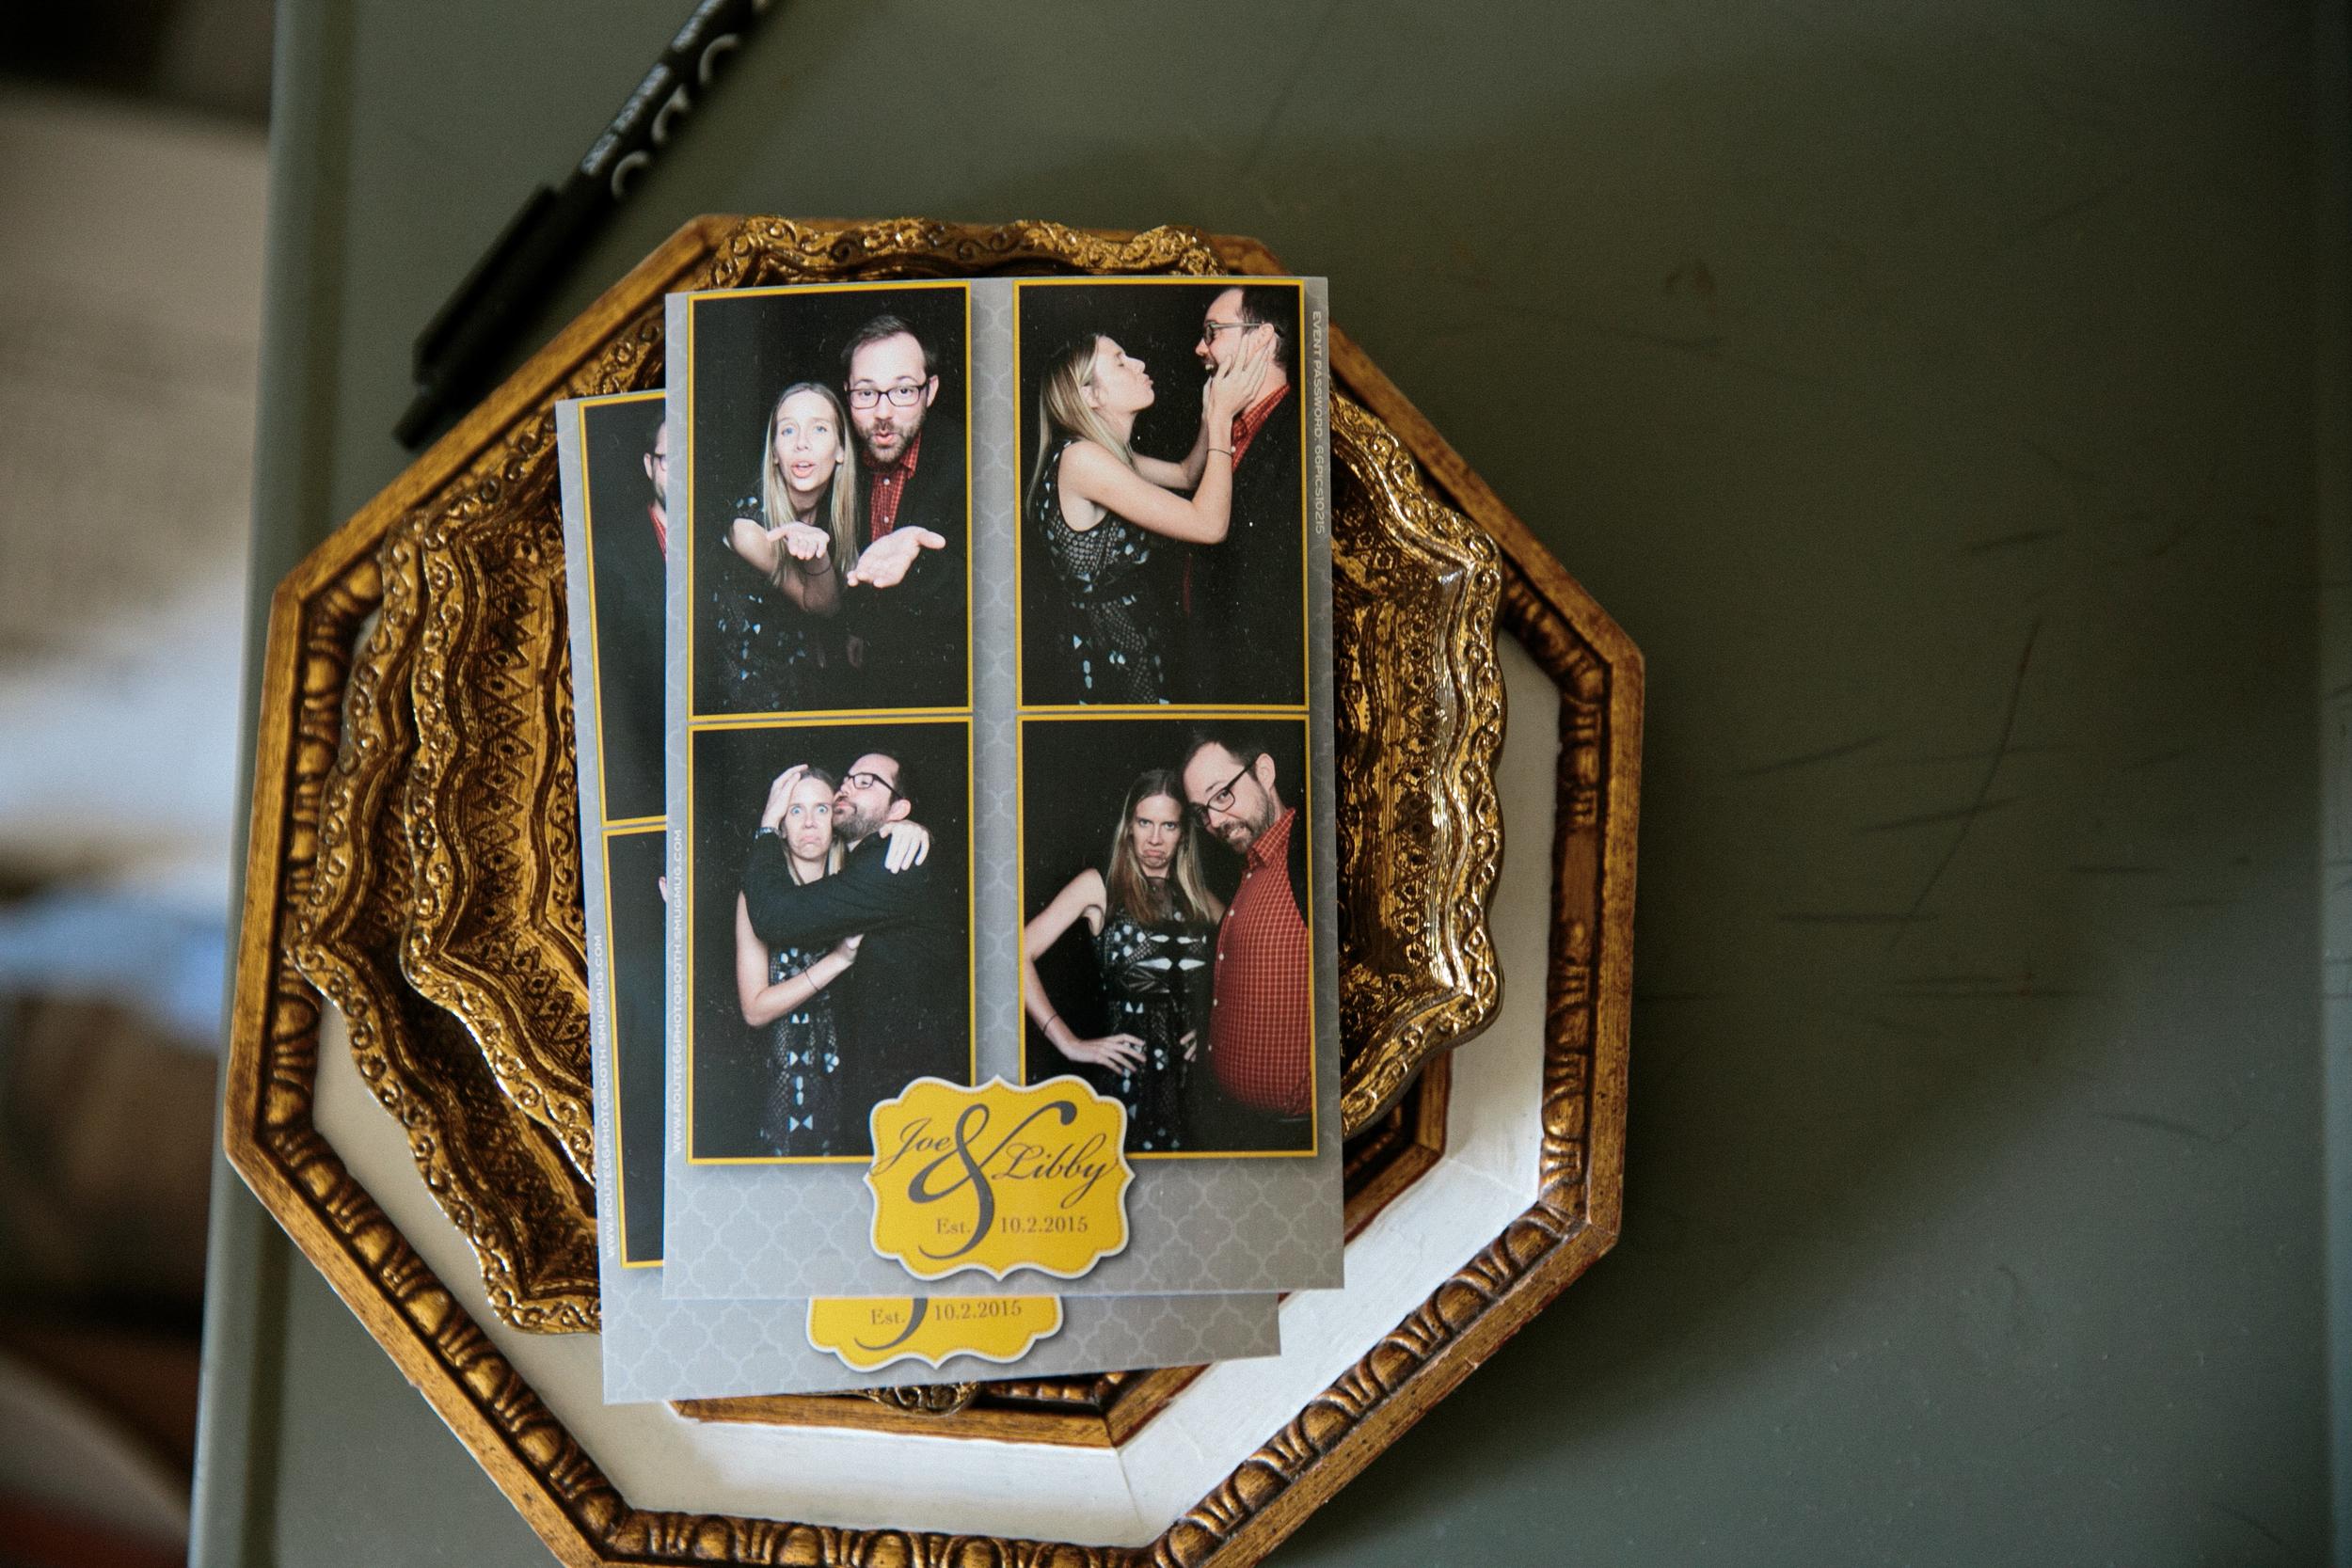 tulsa_oklahoma_wedding-3.jpg